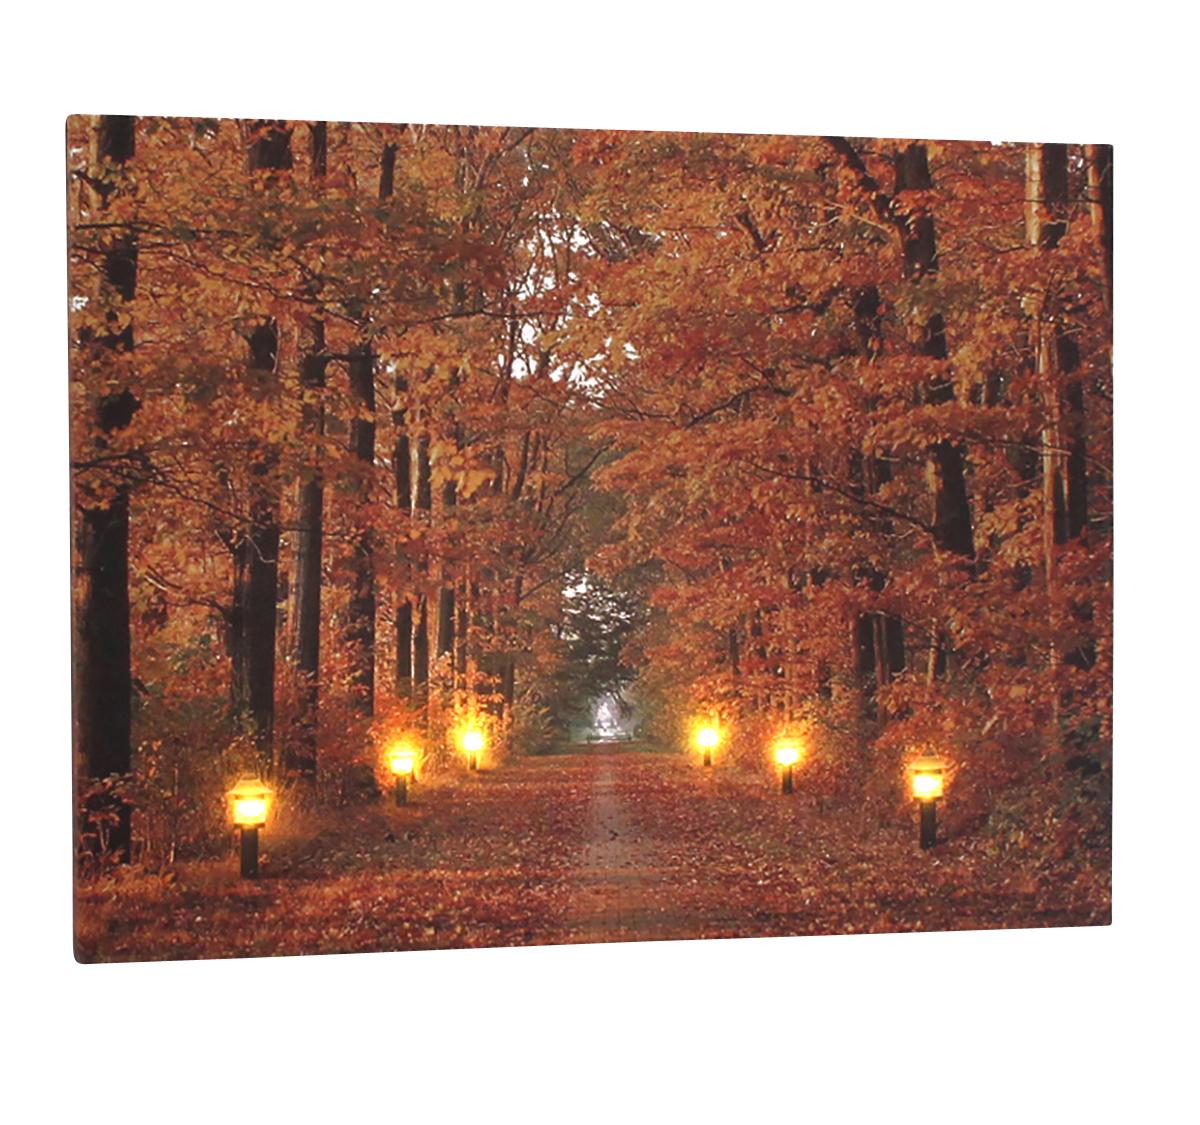 leinwandbild mit led beleuchtung wandbild herbst mit 6 laternen leuchtbild led bild kaufen bei. Black Bedroom Furniture Sets. Home Design Ideas